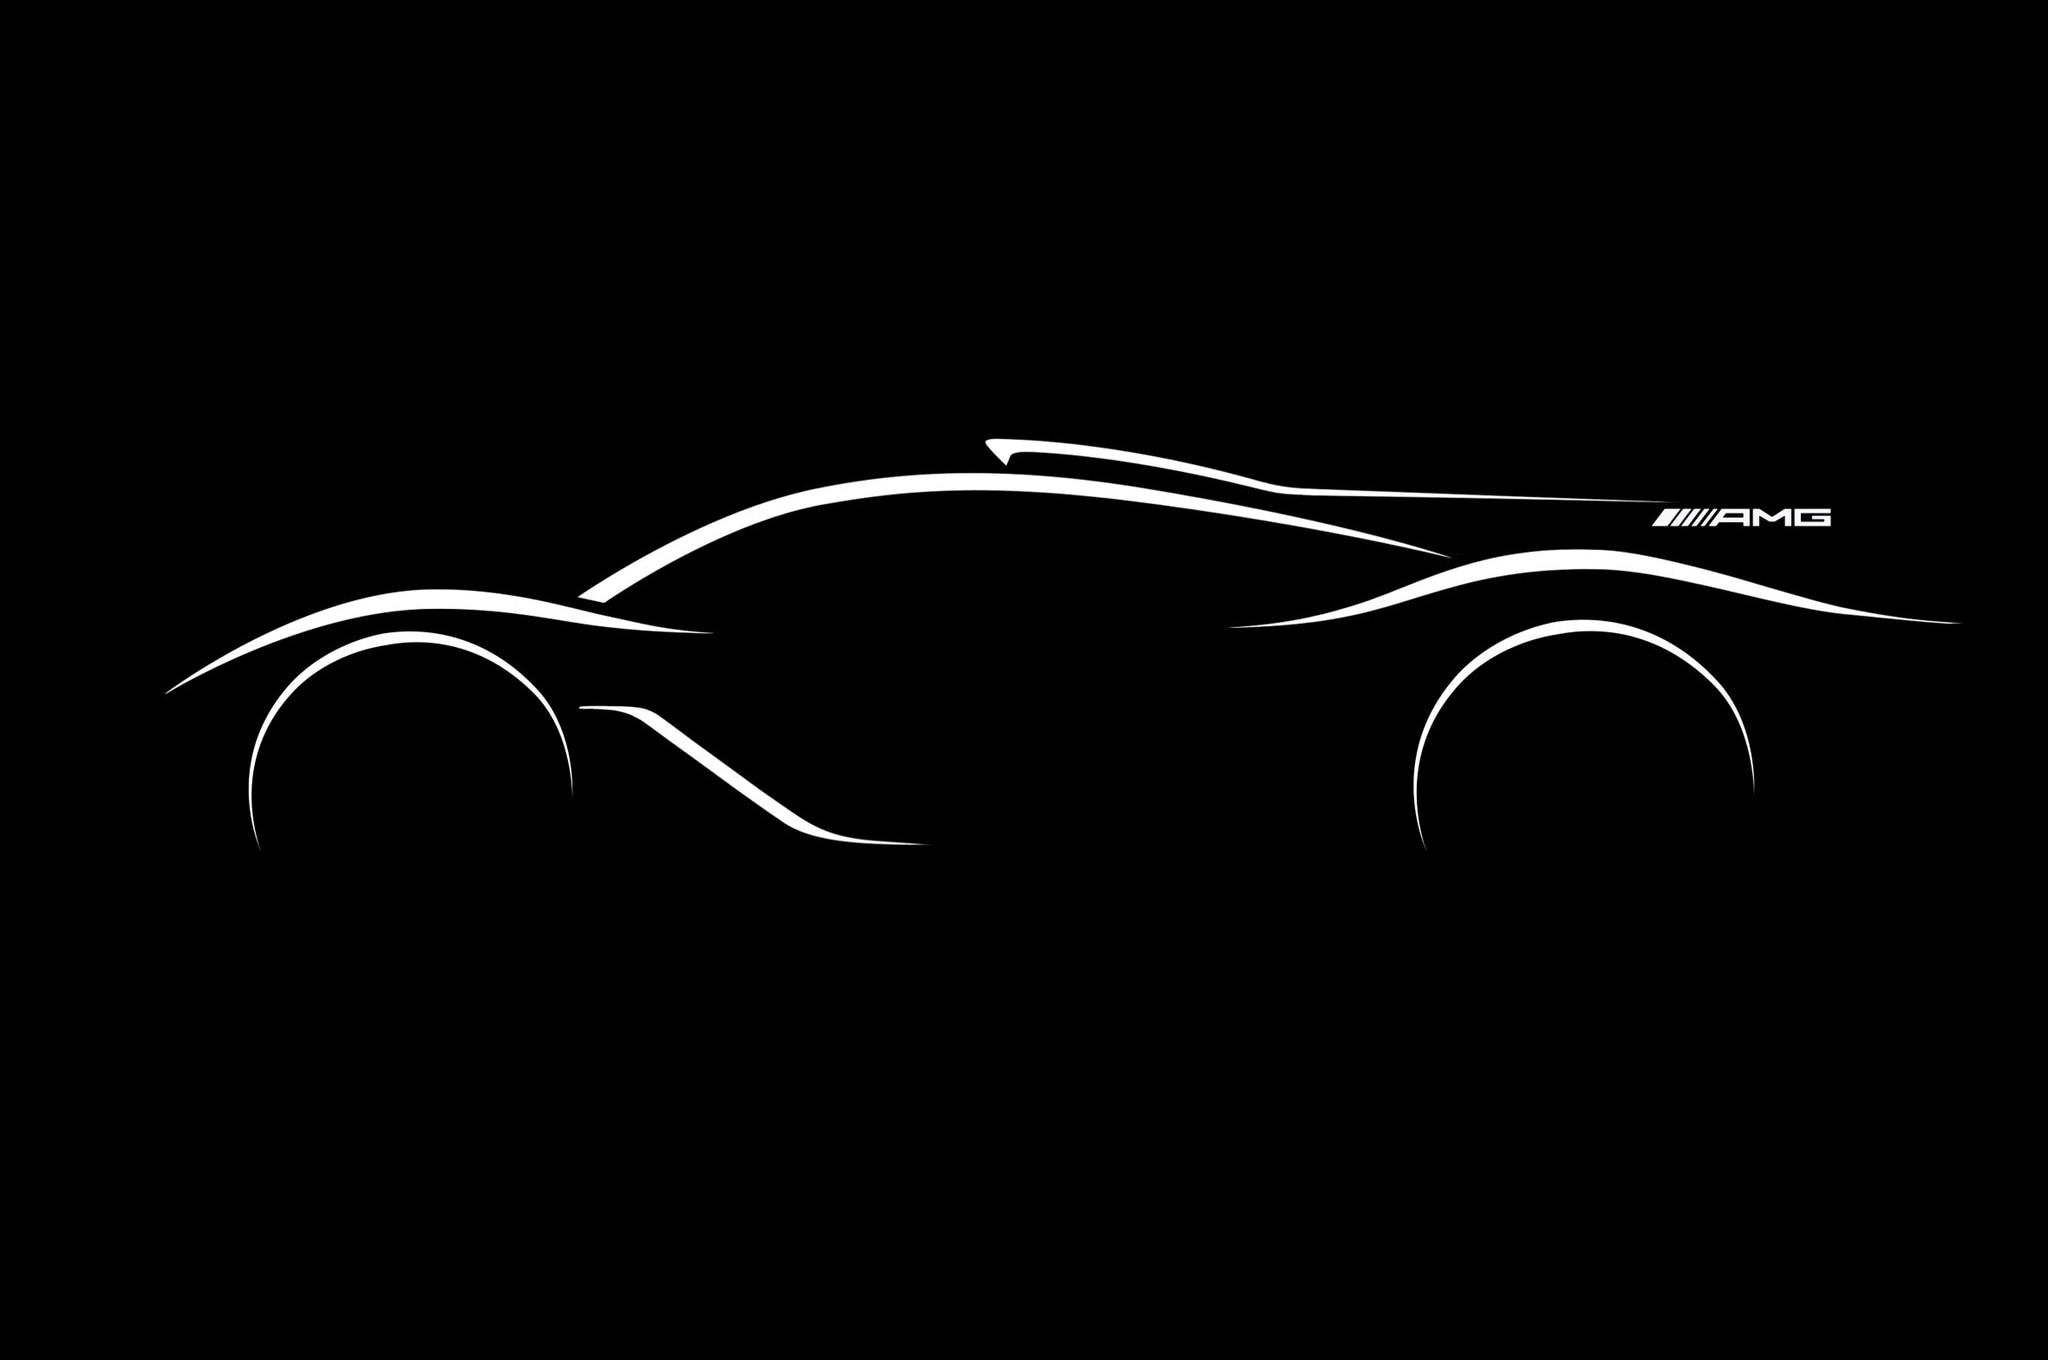 Mercedes Hypercar Teaser